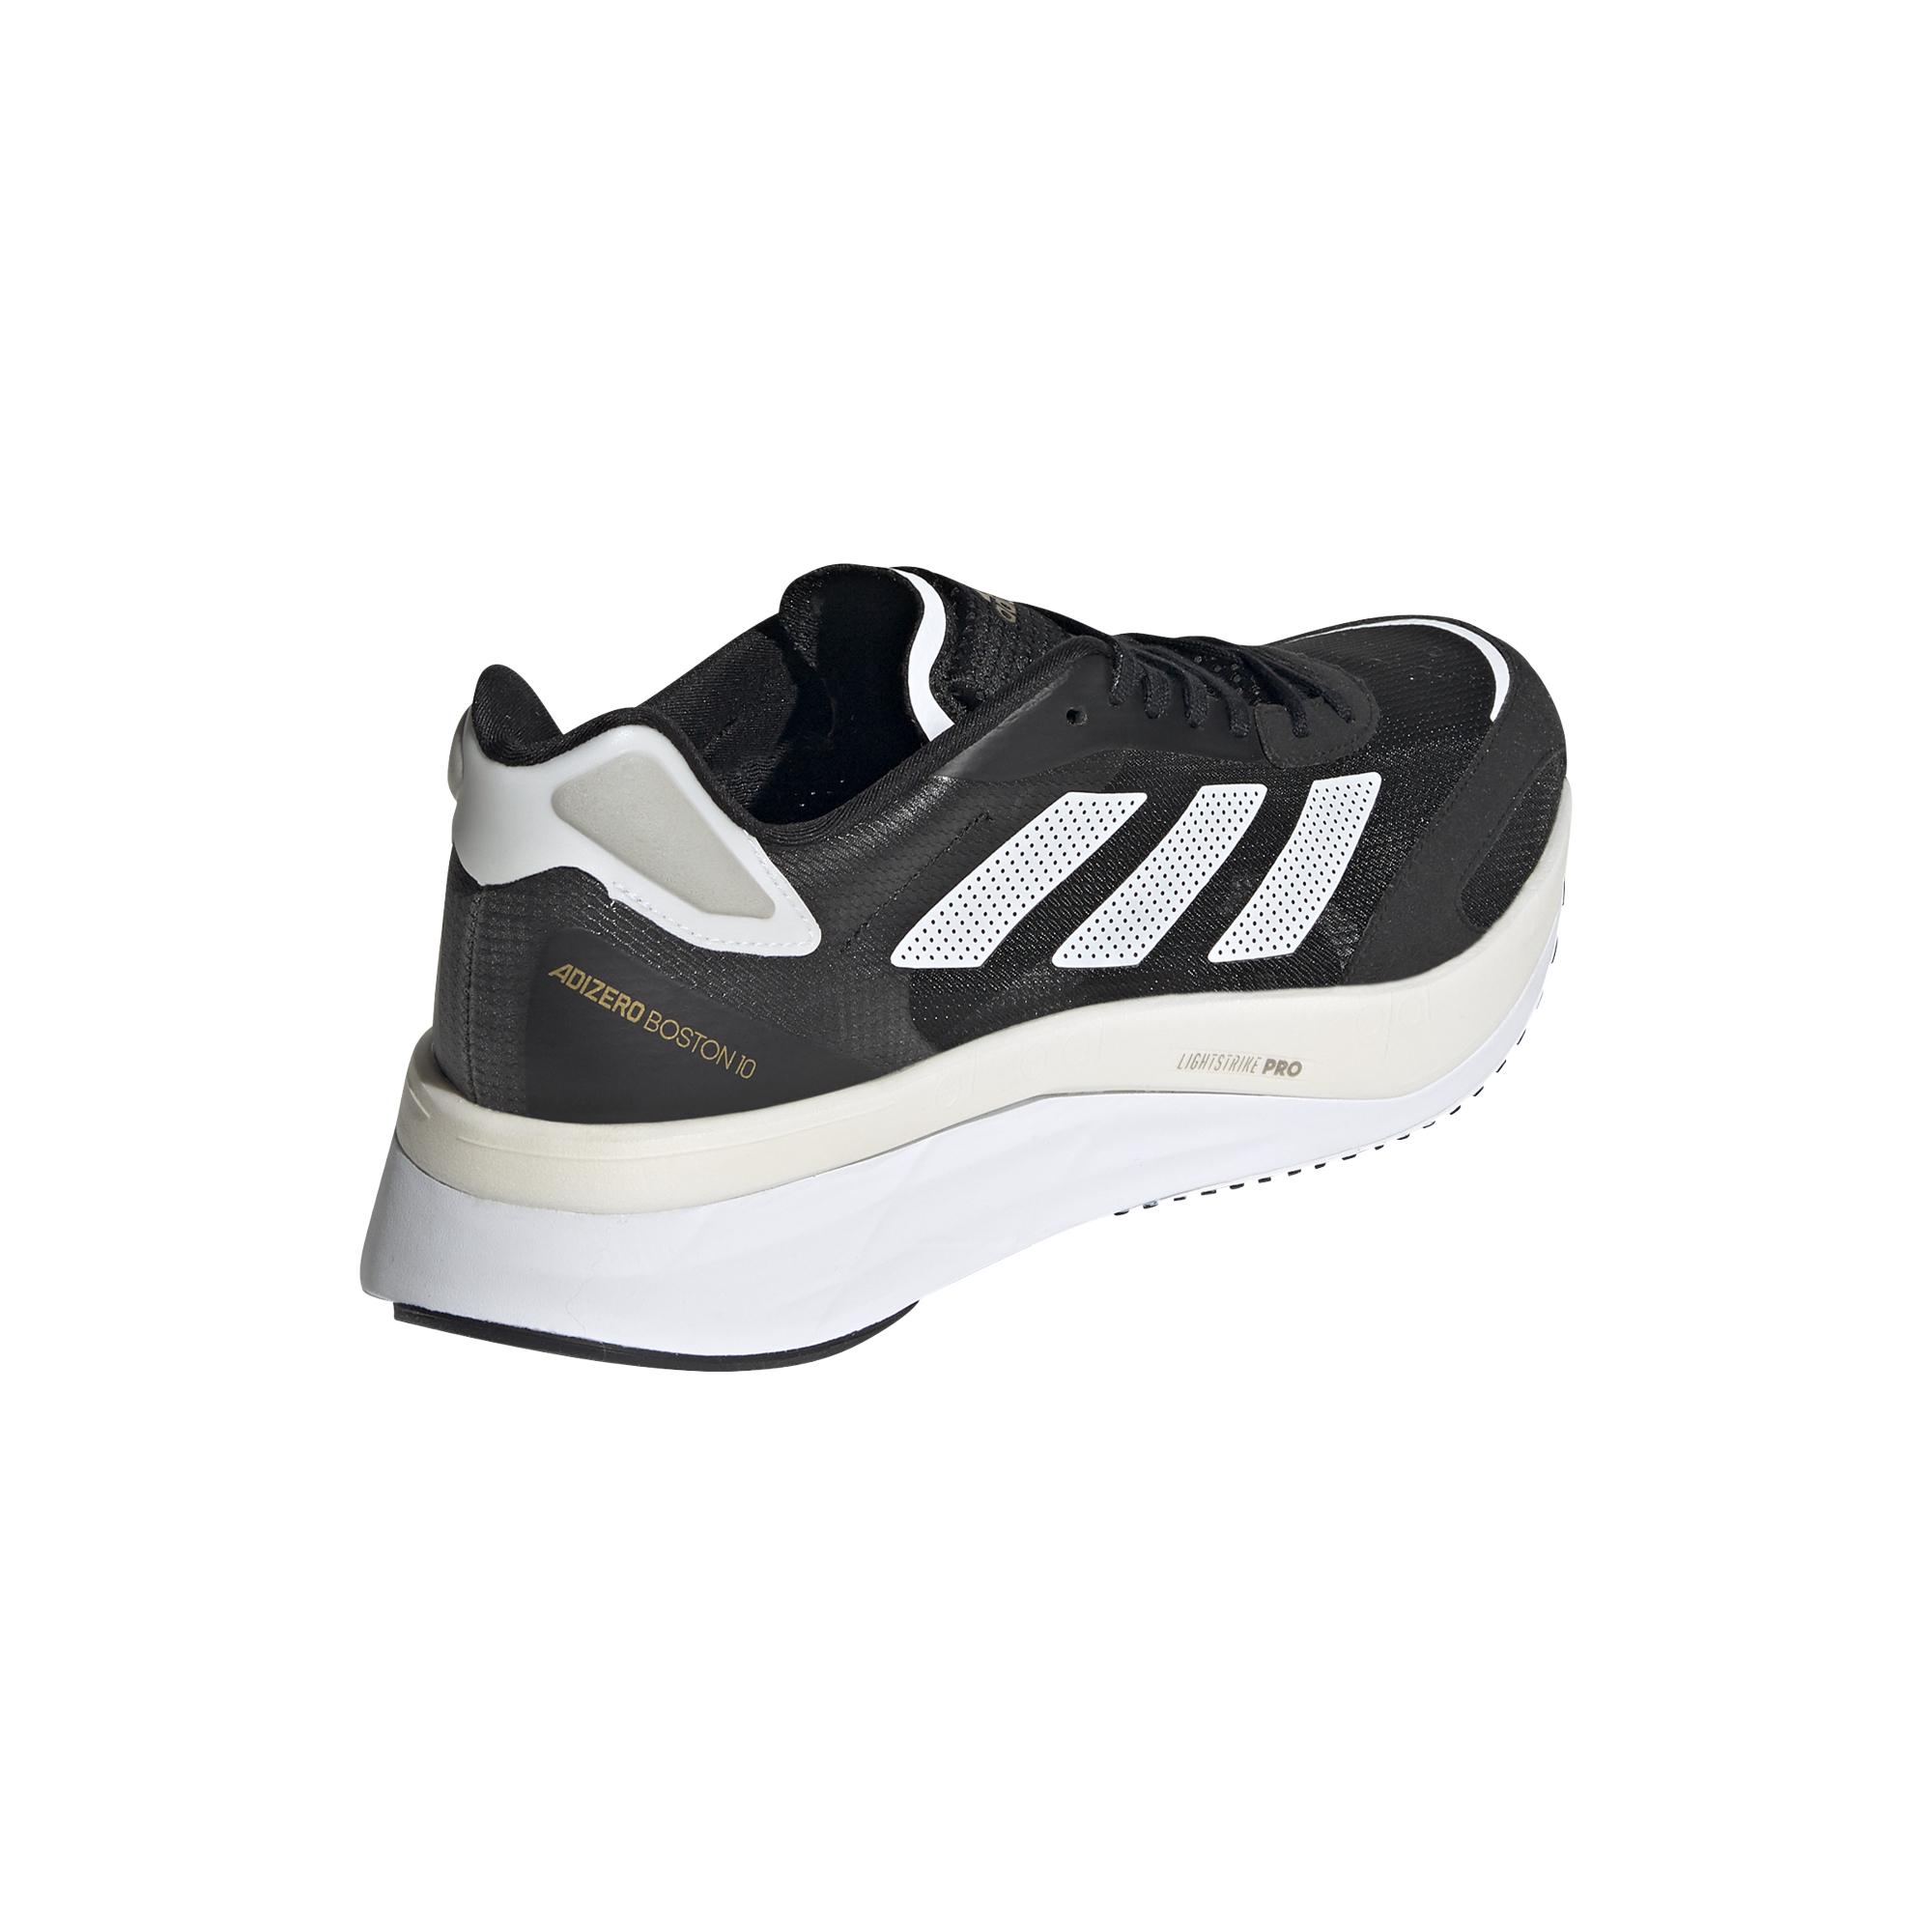 Men's Adidas Adizero Boston 10 Running Shoe - Color: Core Black / Cloud White / Gold Metallic - Size: 6.5 - Width: Regular, Core Black / Cloud White / Gold Metallic, large, image 6